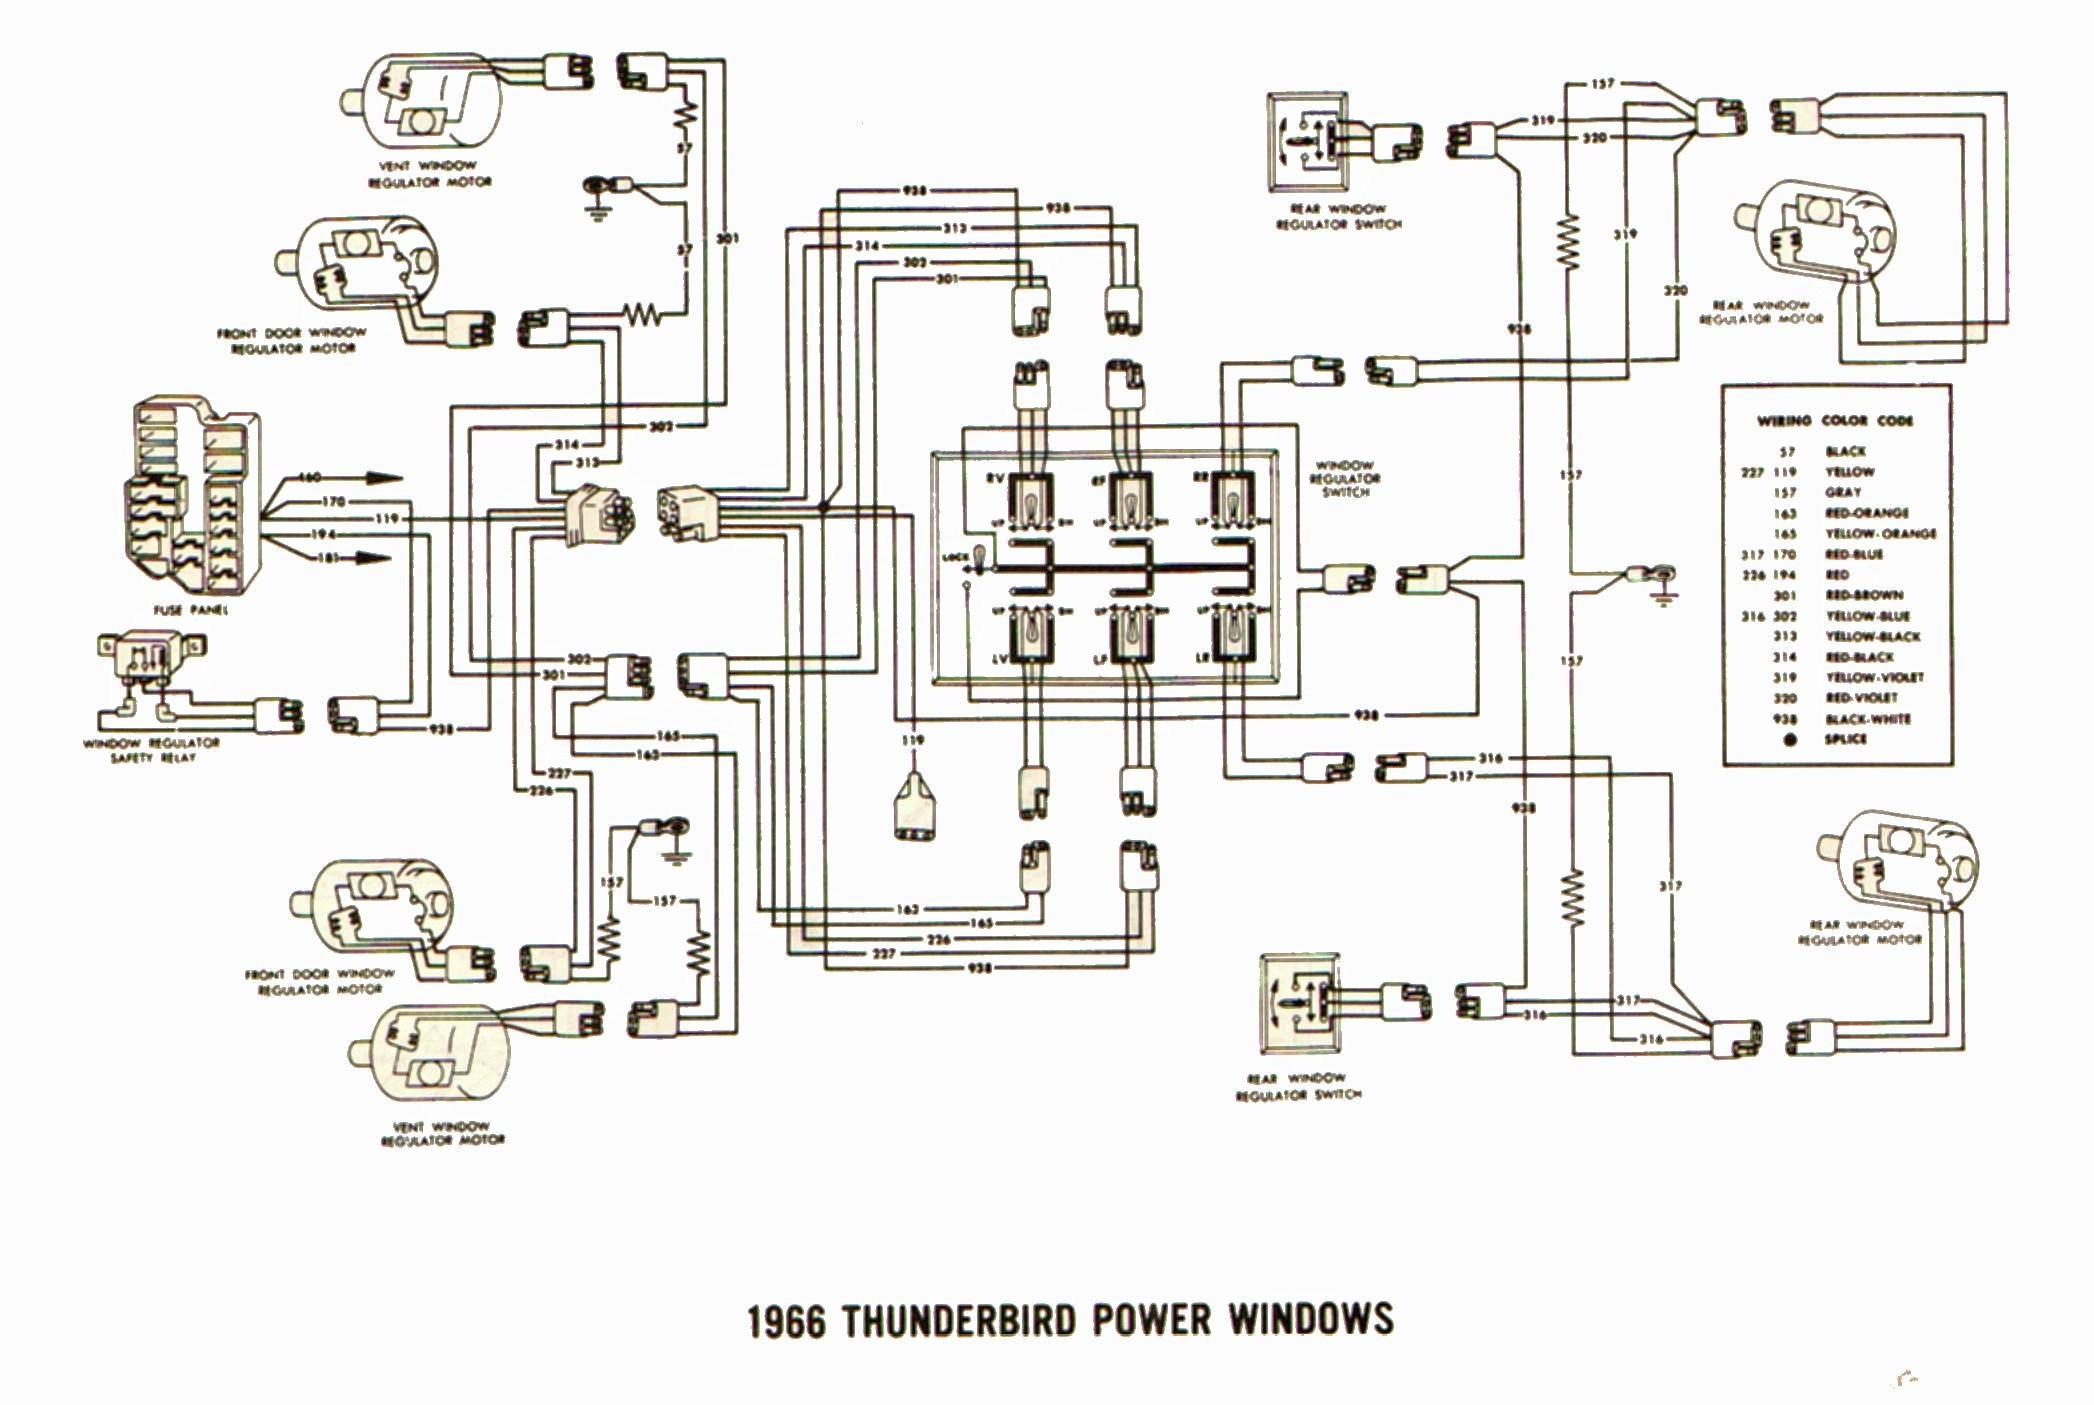 Power Window Wiring Diagram Nissan Altima Wiring Diagrams Of Power Window Wiring Diagram